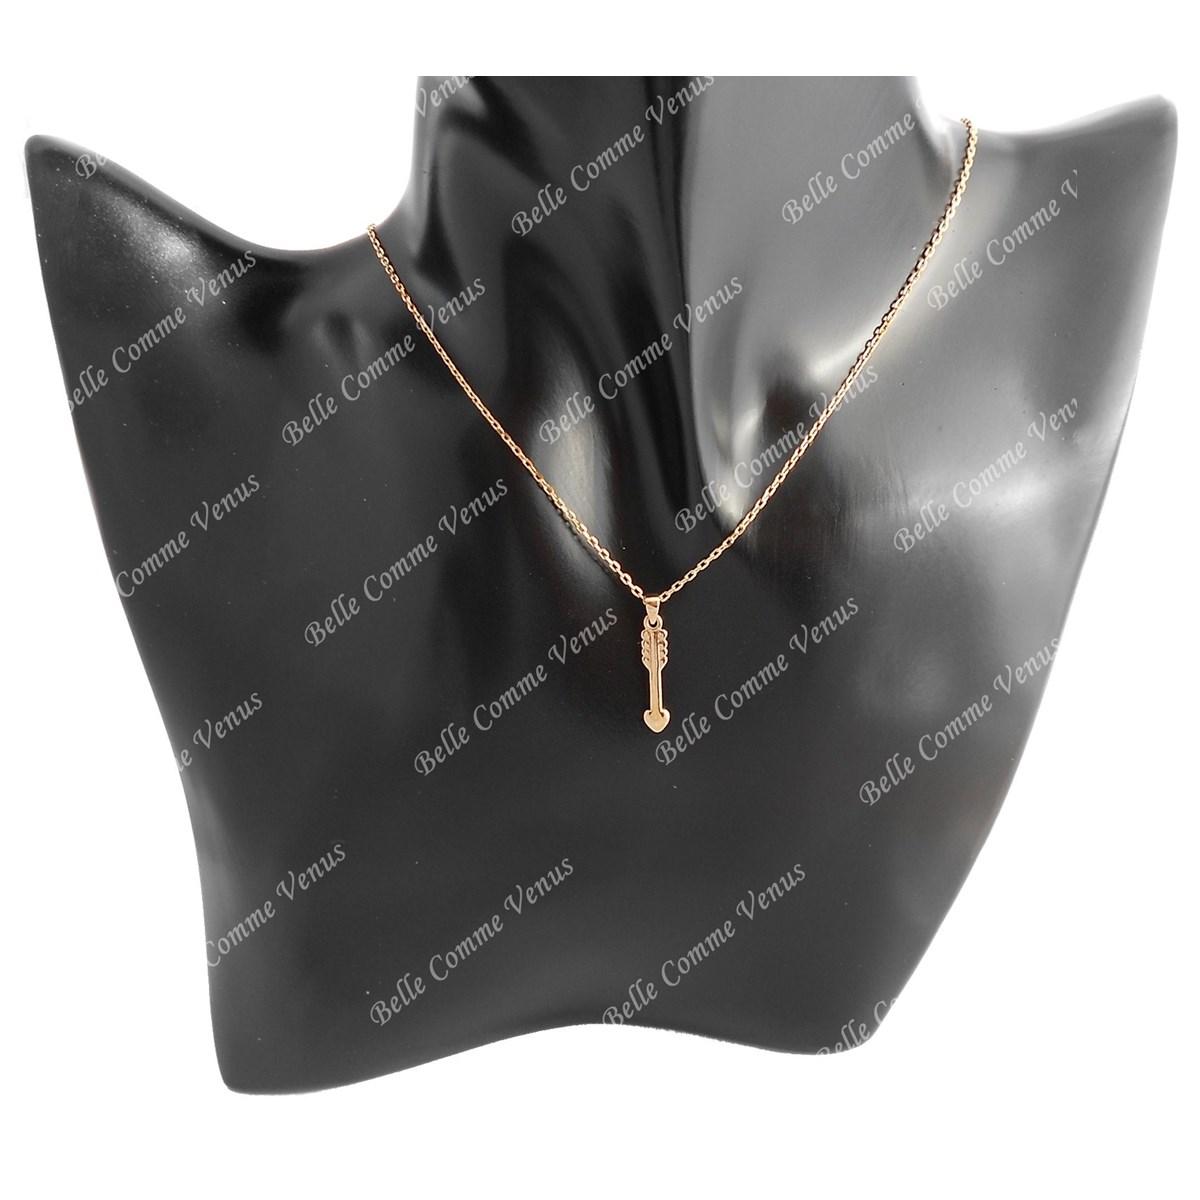 3 Plaqué Collier 750 Coeur Or Flèche Femme Microns HDE29I